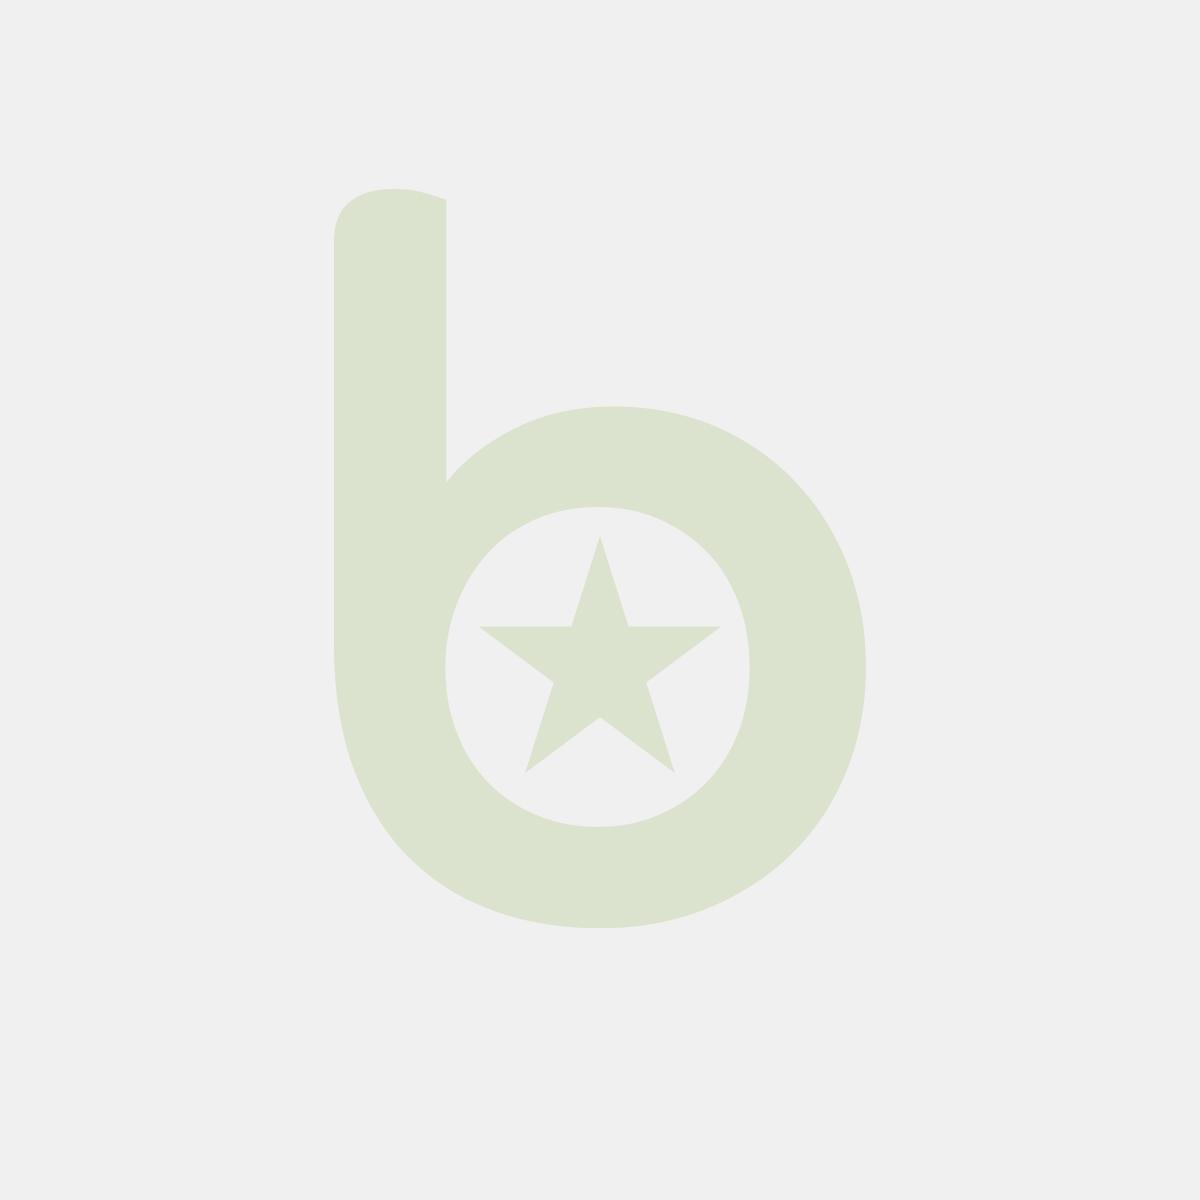 FINGERFOOD - BIO talerzyk SHELLY MINI L PLA, transparenty, 17x12cm op. 50 sztuk